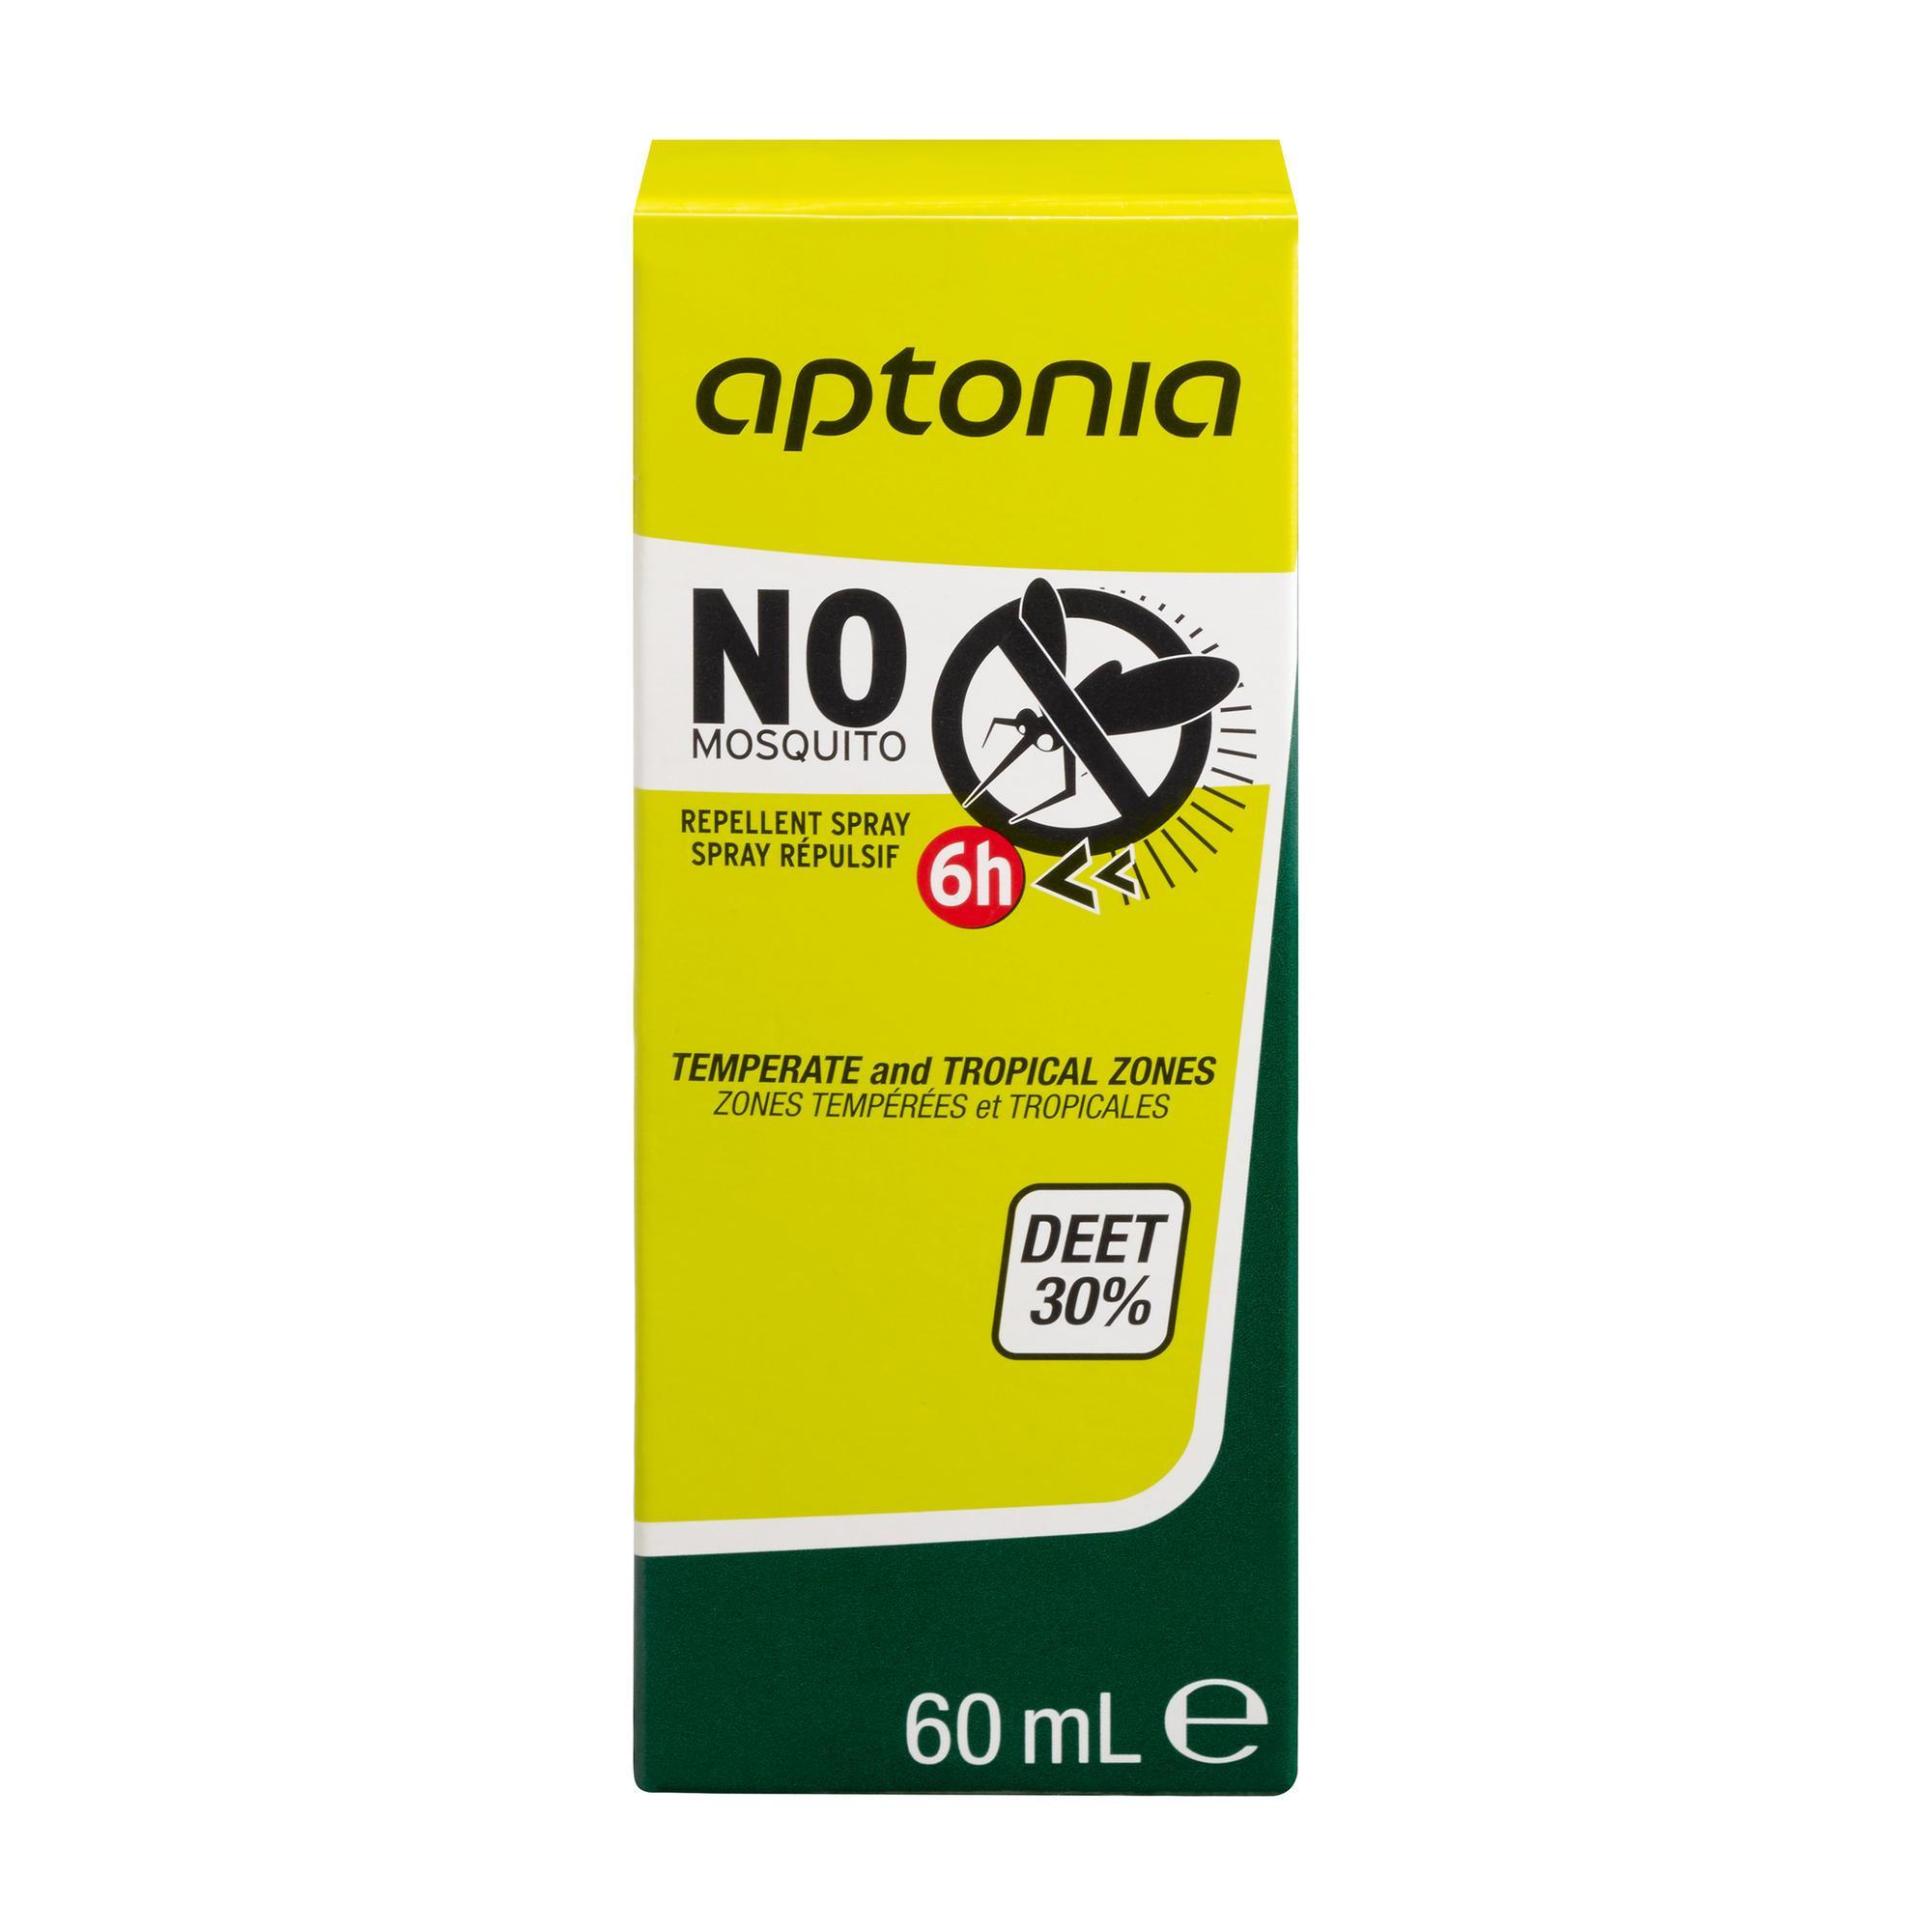 ANTI-INSECTE VAPORISATEUR APTONIA DEET 30% 60 ML - Forclaz